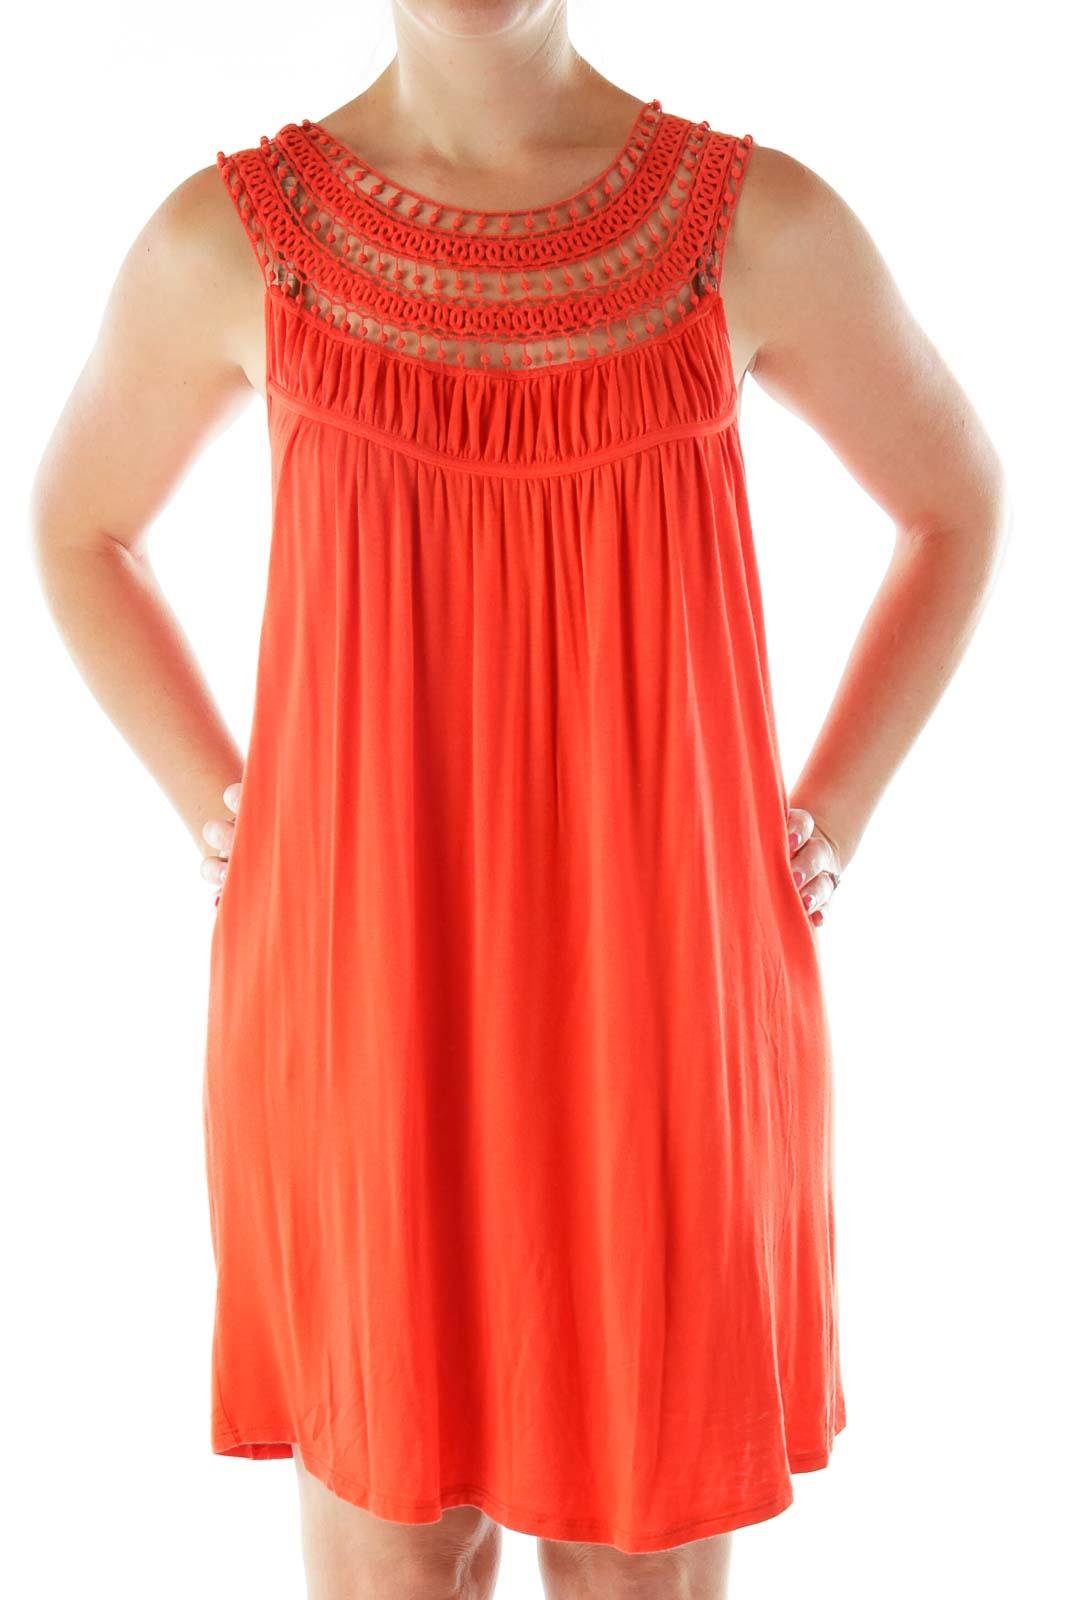 Orange Crocheted Day Dress Front